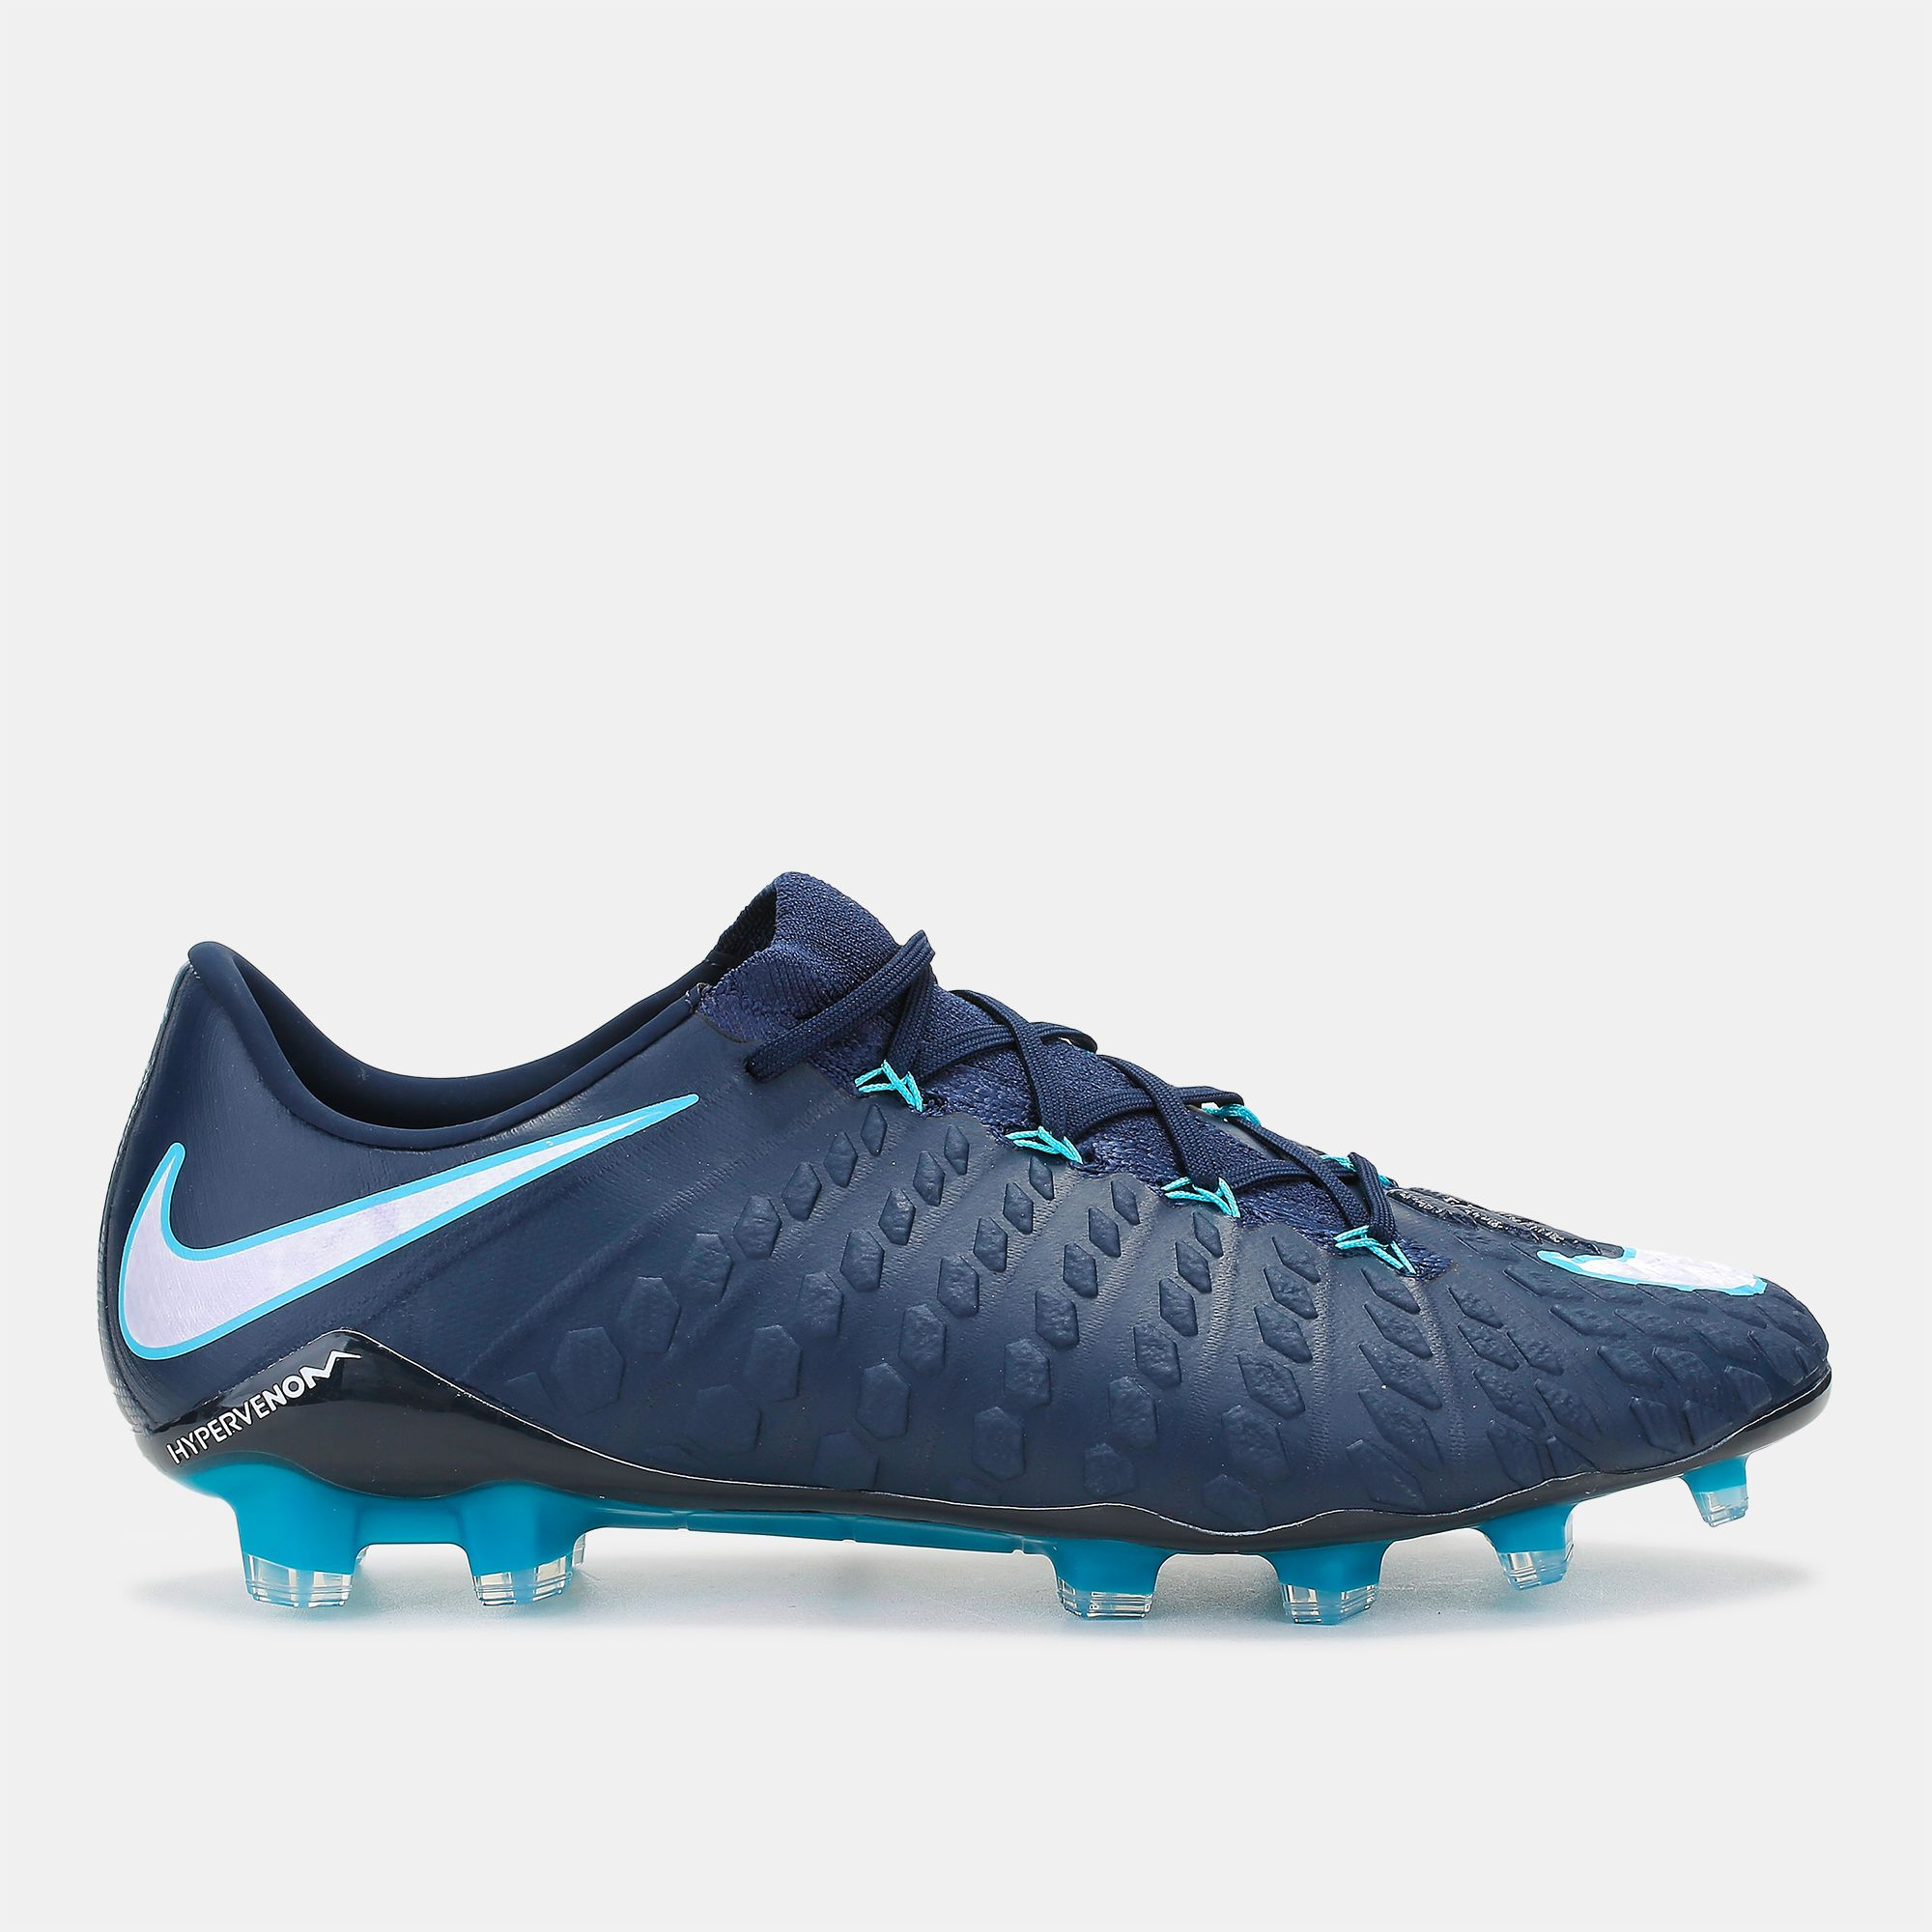 edb4f6147 ... inexpensive nike hypervenom phantom iii firm ground football shoe f4f3b  5405a